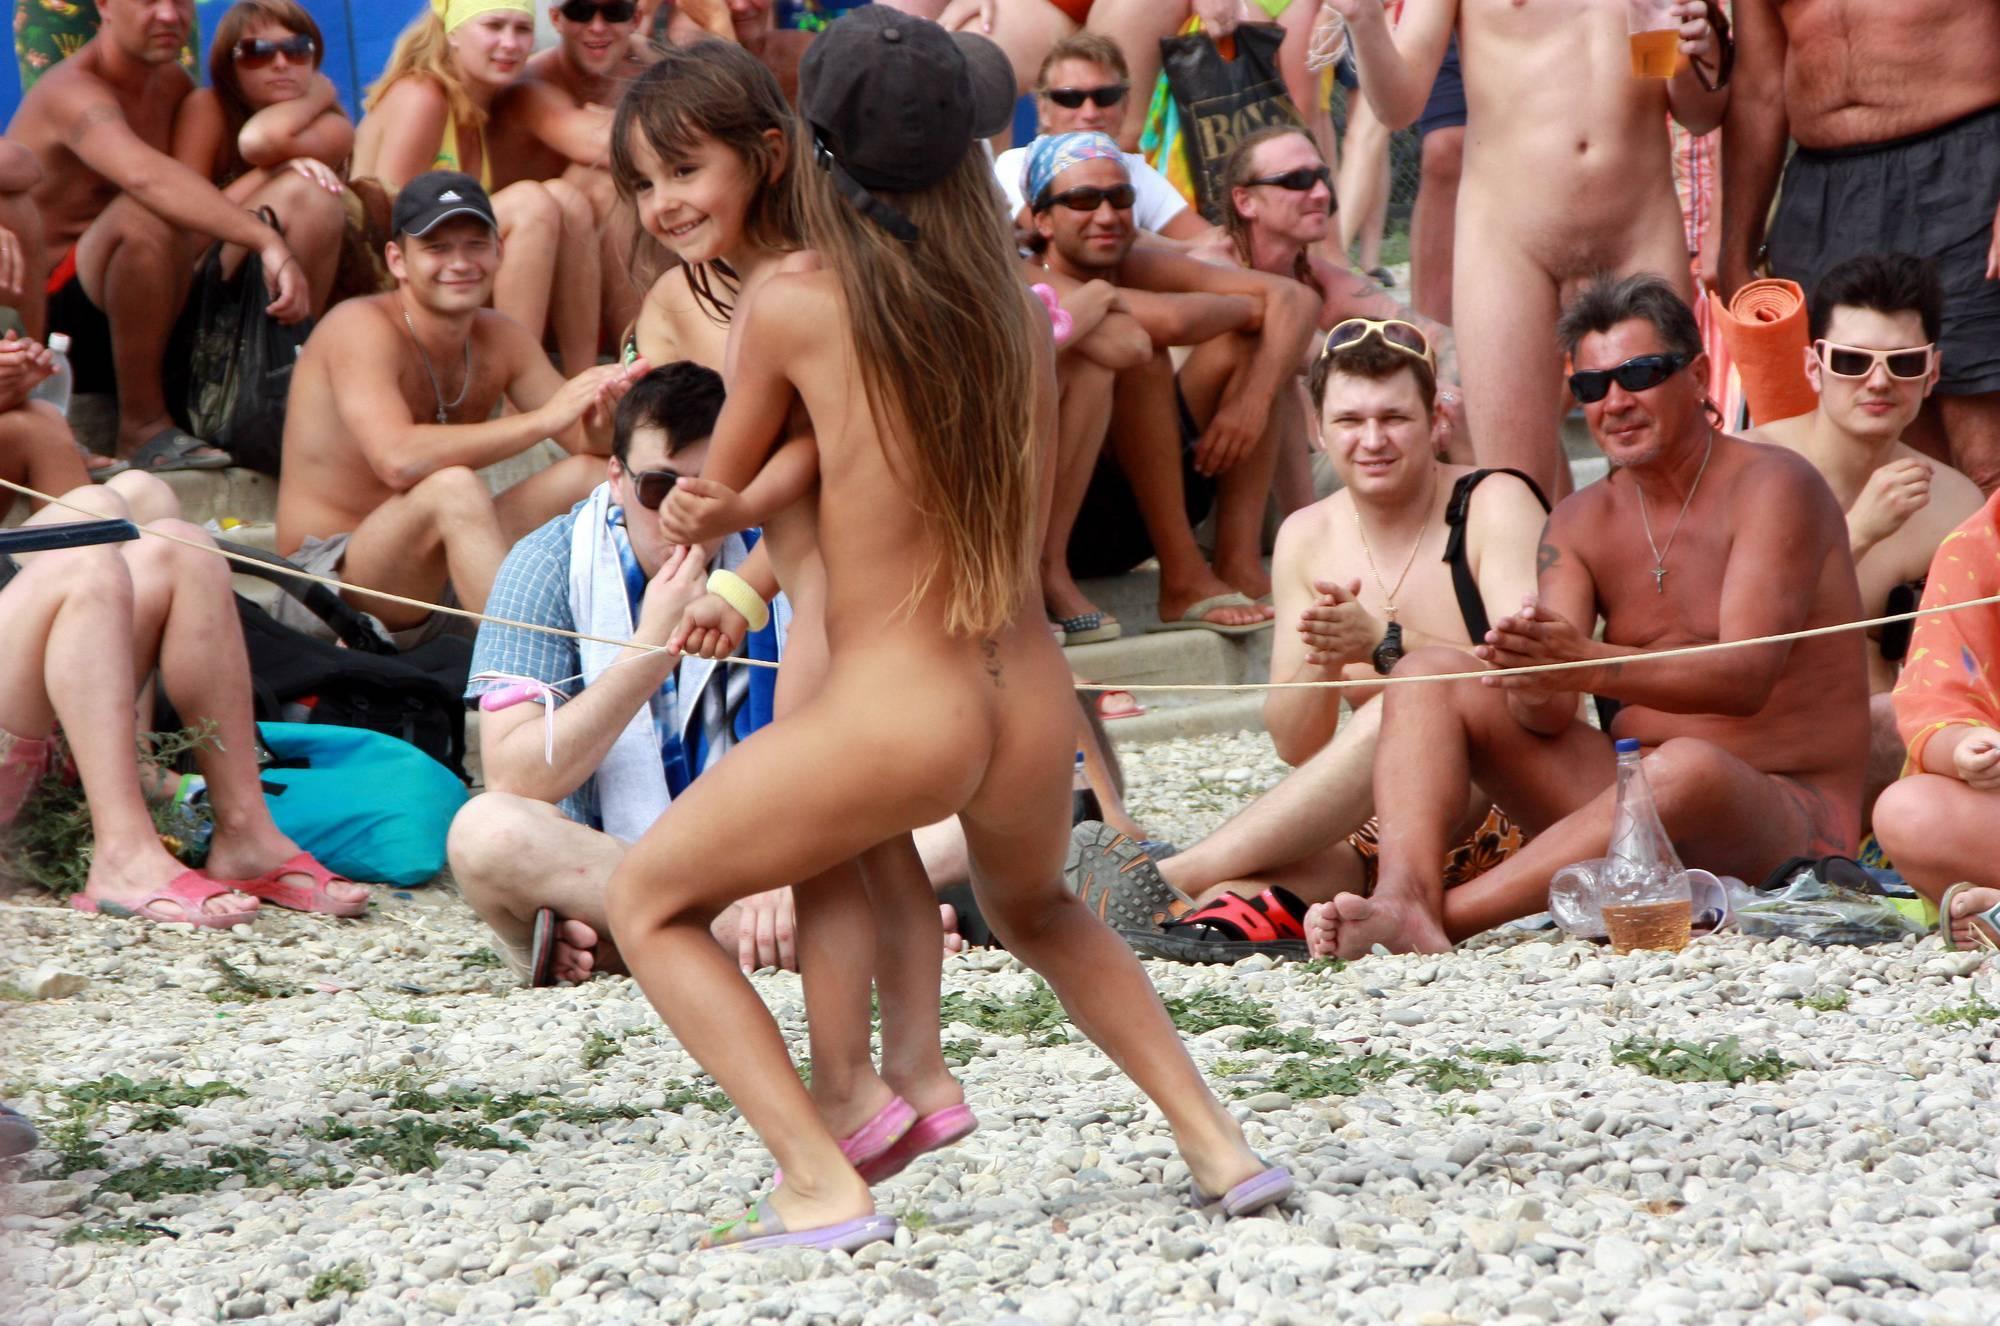 Nudist Duet Girl Rundown - 3